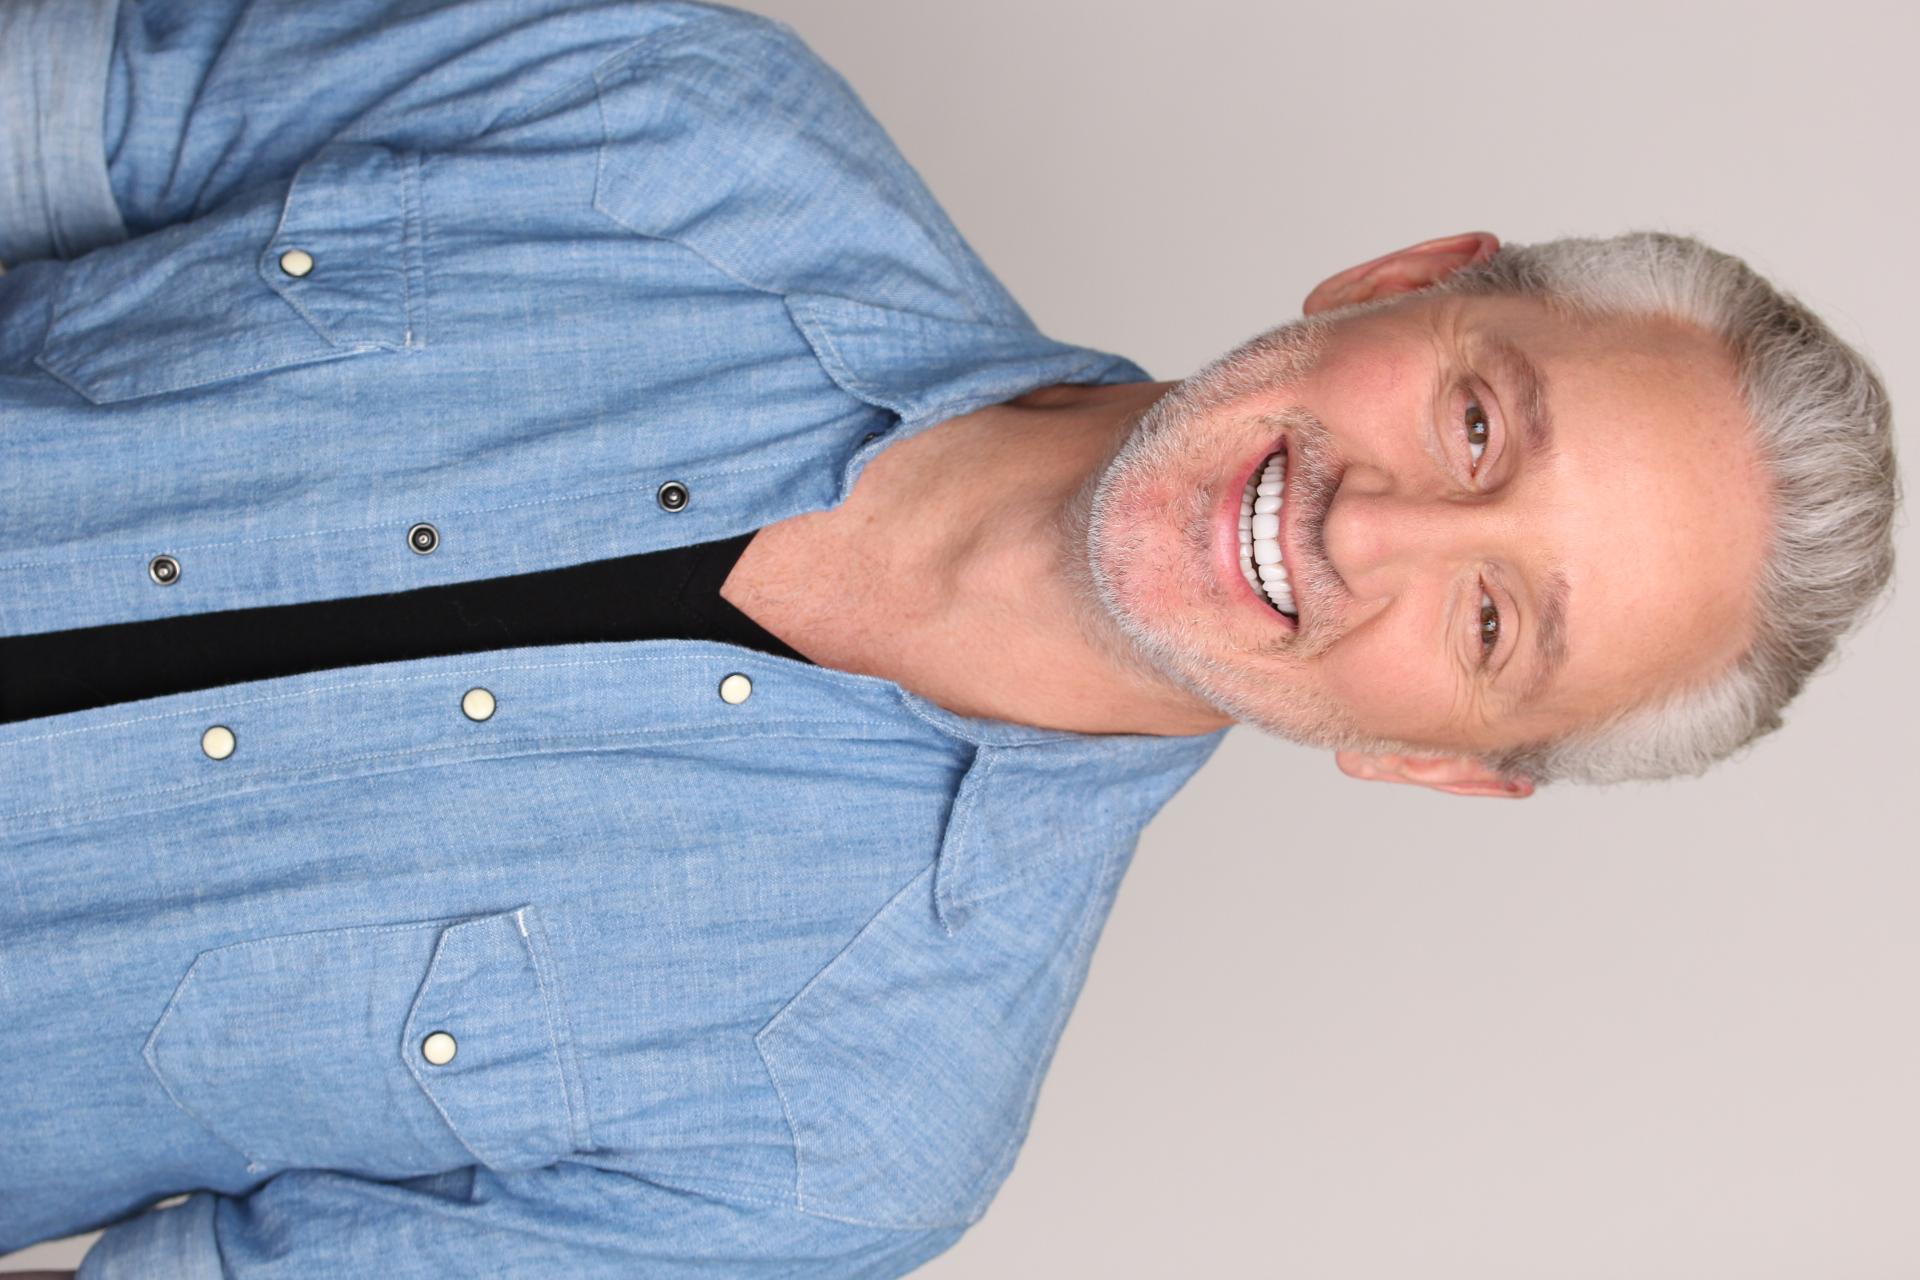 Tim Molyneux